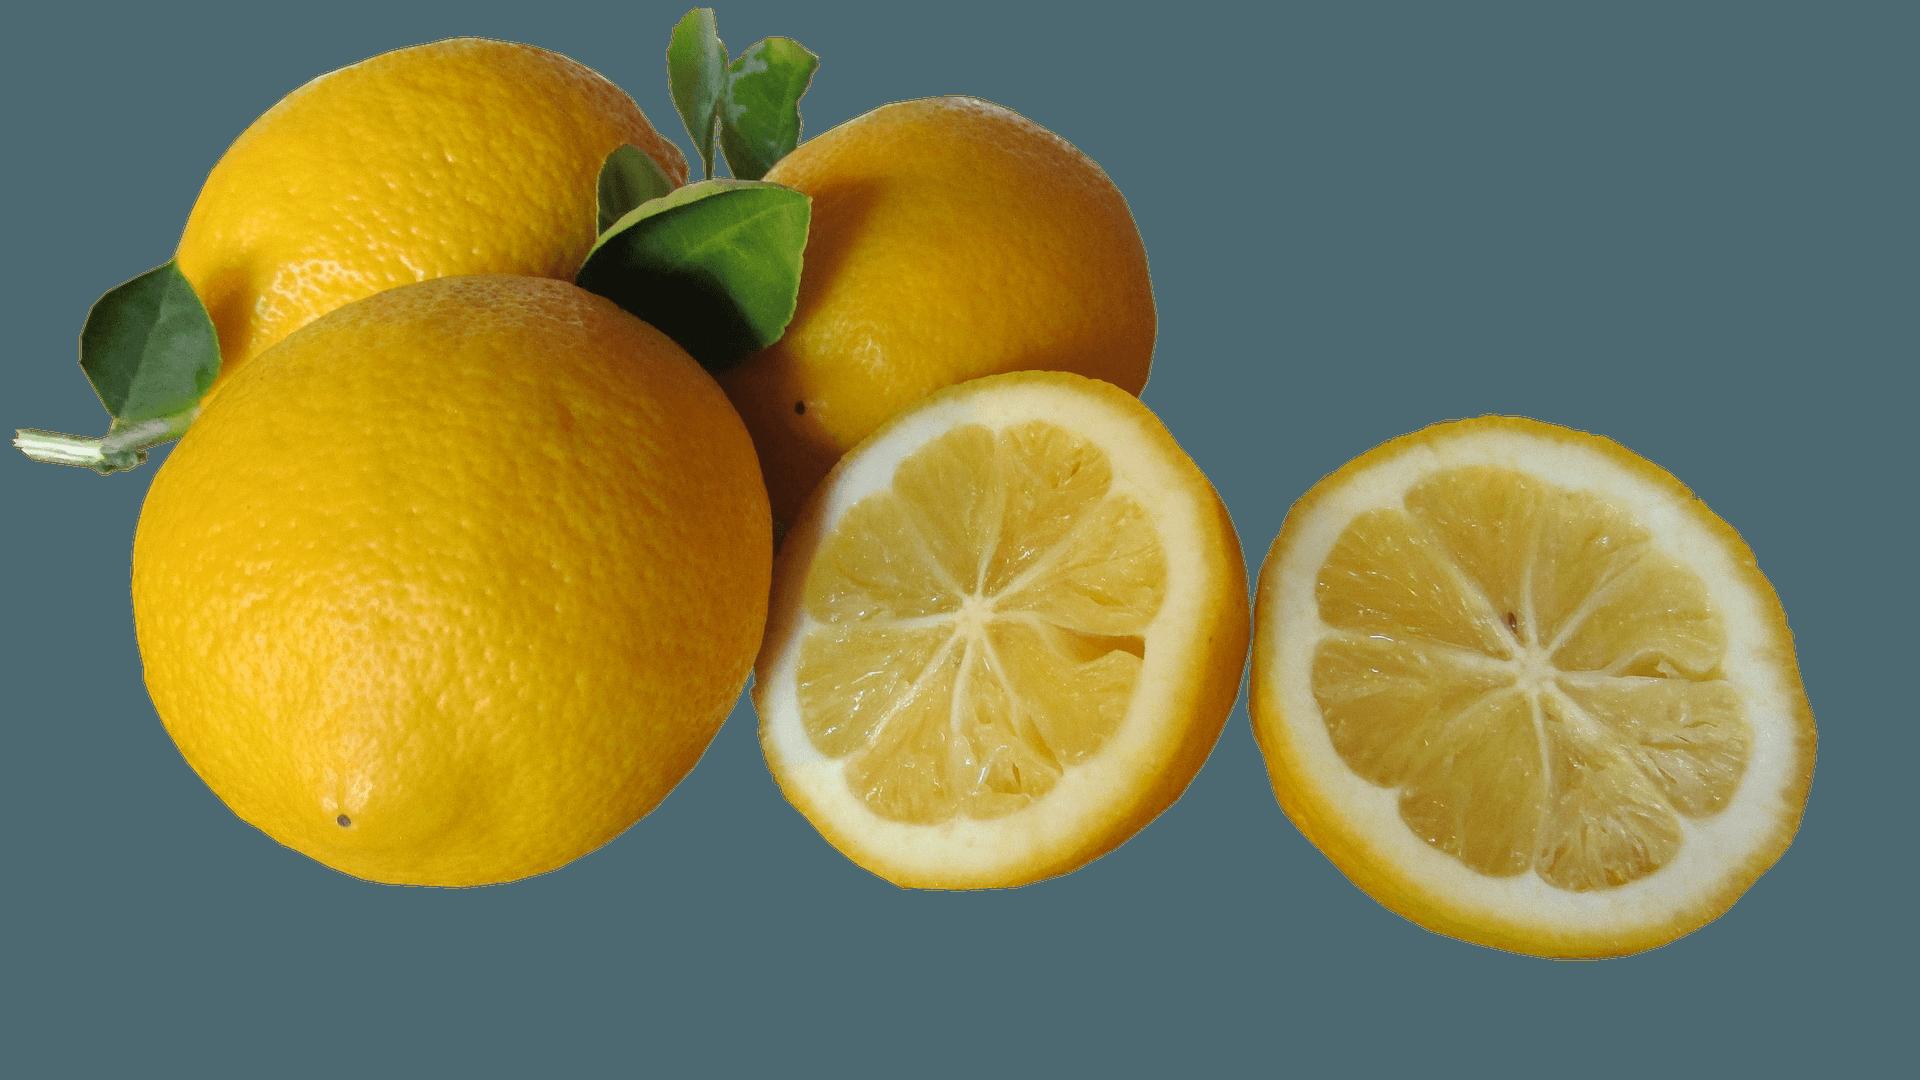 limones - Cajas degustación Ibizagrove